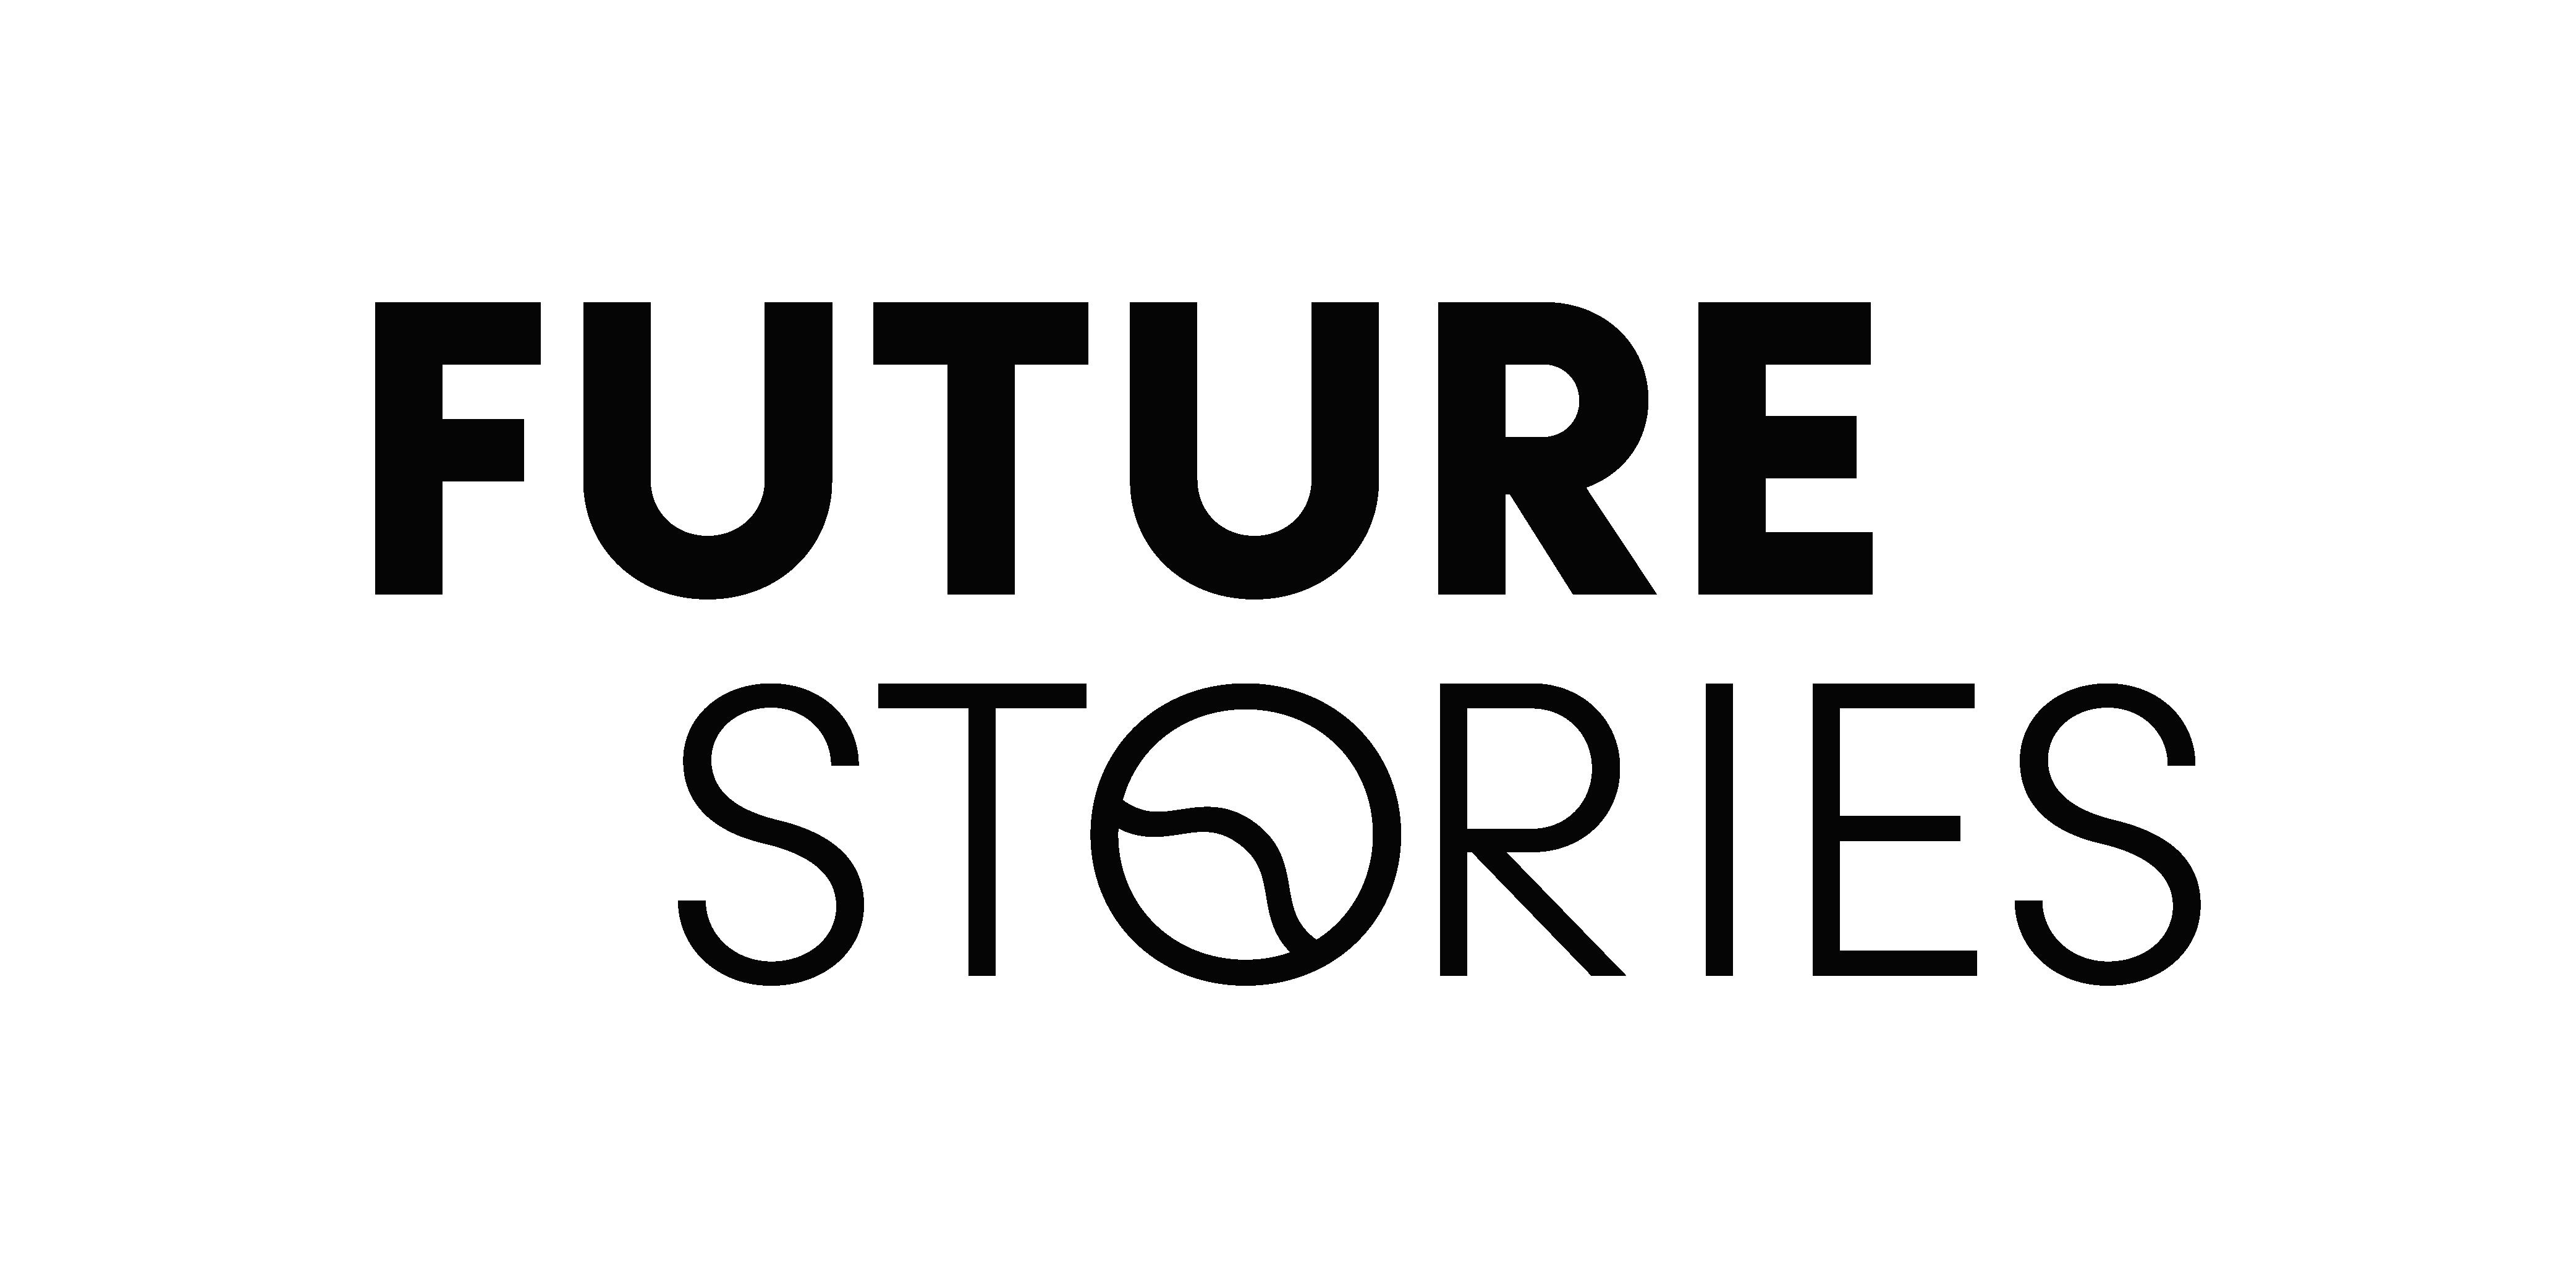 FUTURE STORIES